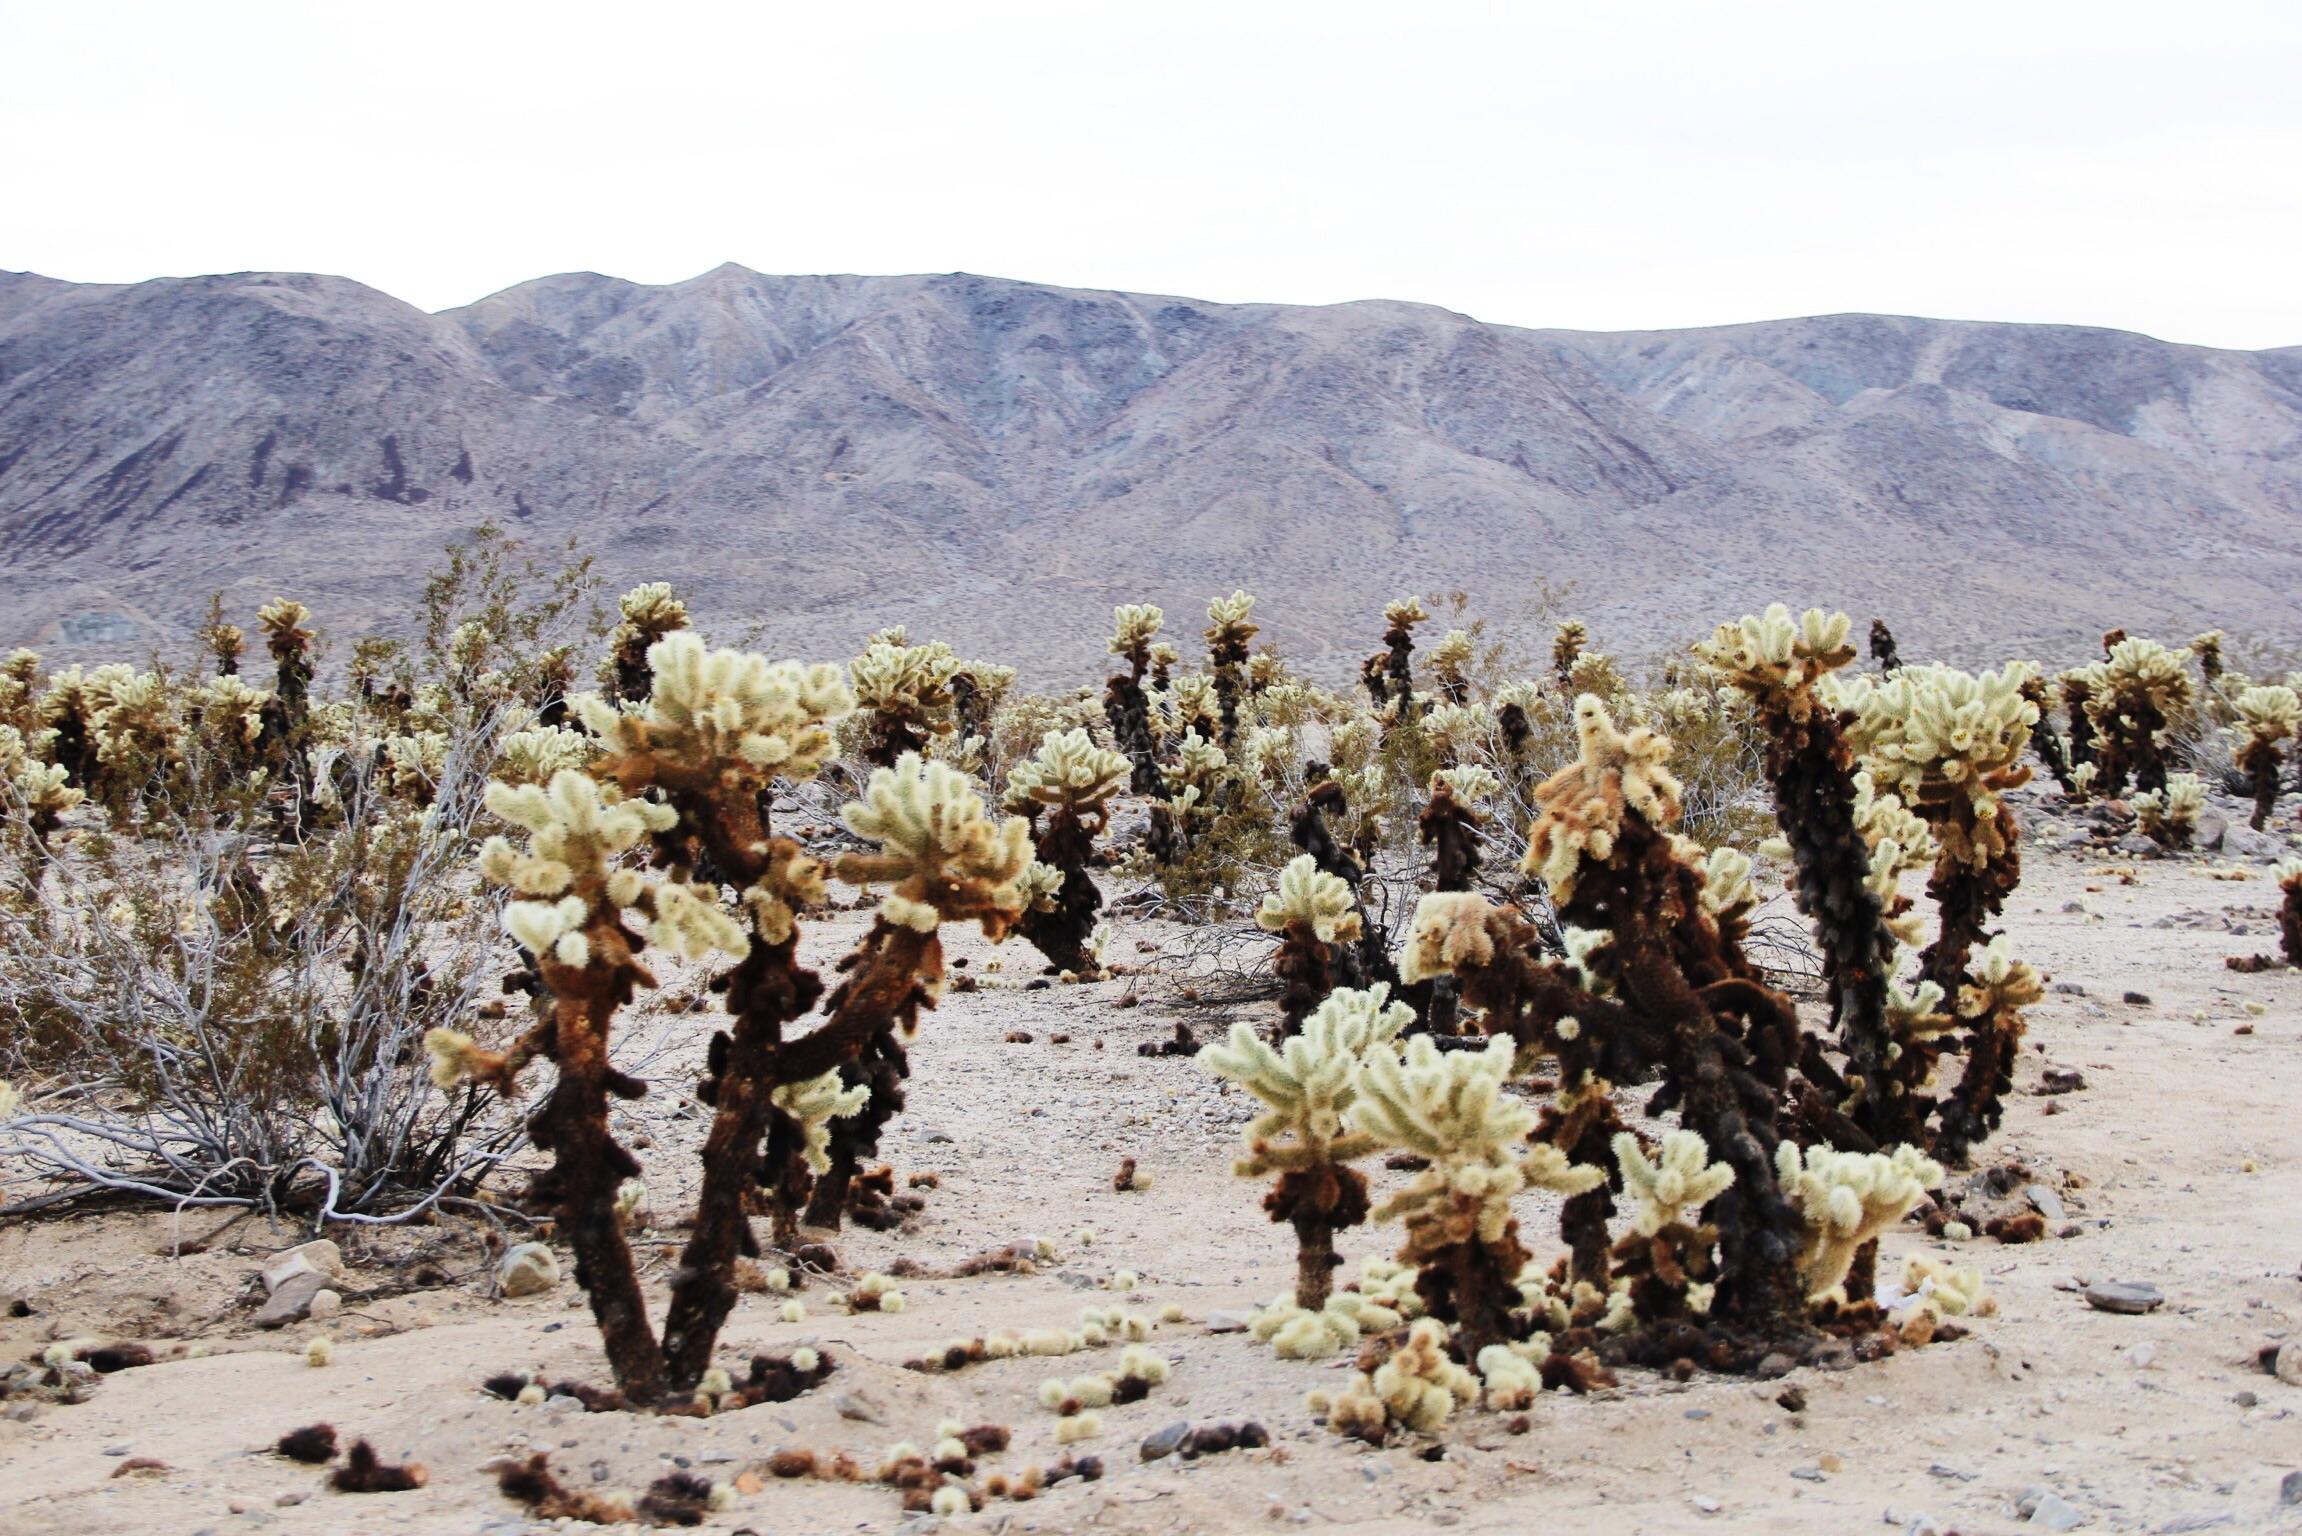 The Cholla Cactus Garden in Joshua Tree National Park